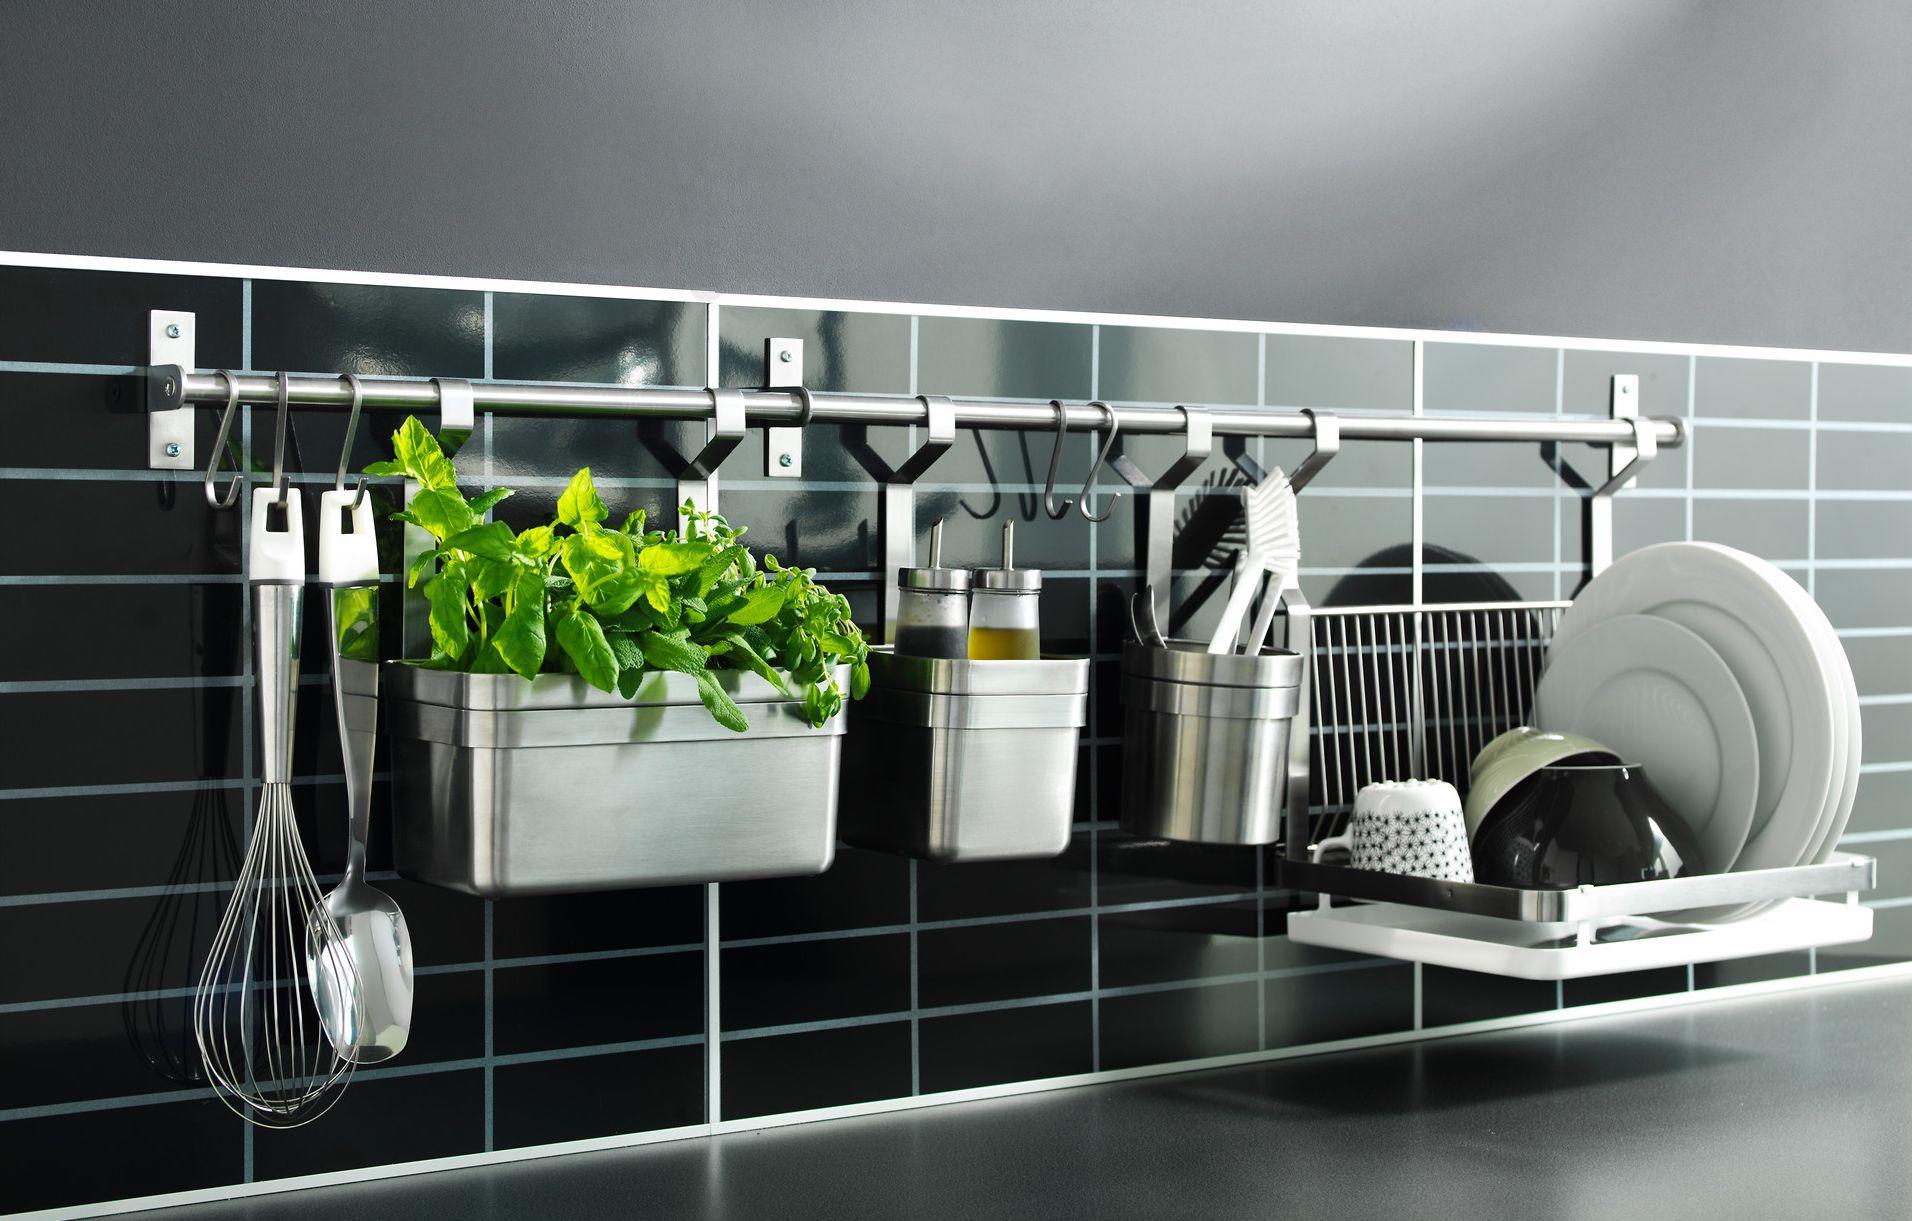 mutfak-depolama-ve-duzenleme-fikirleri